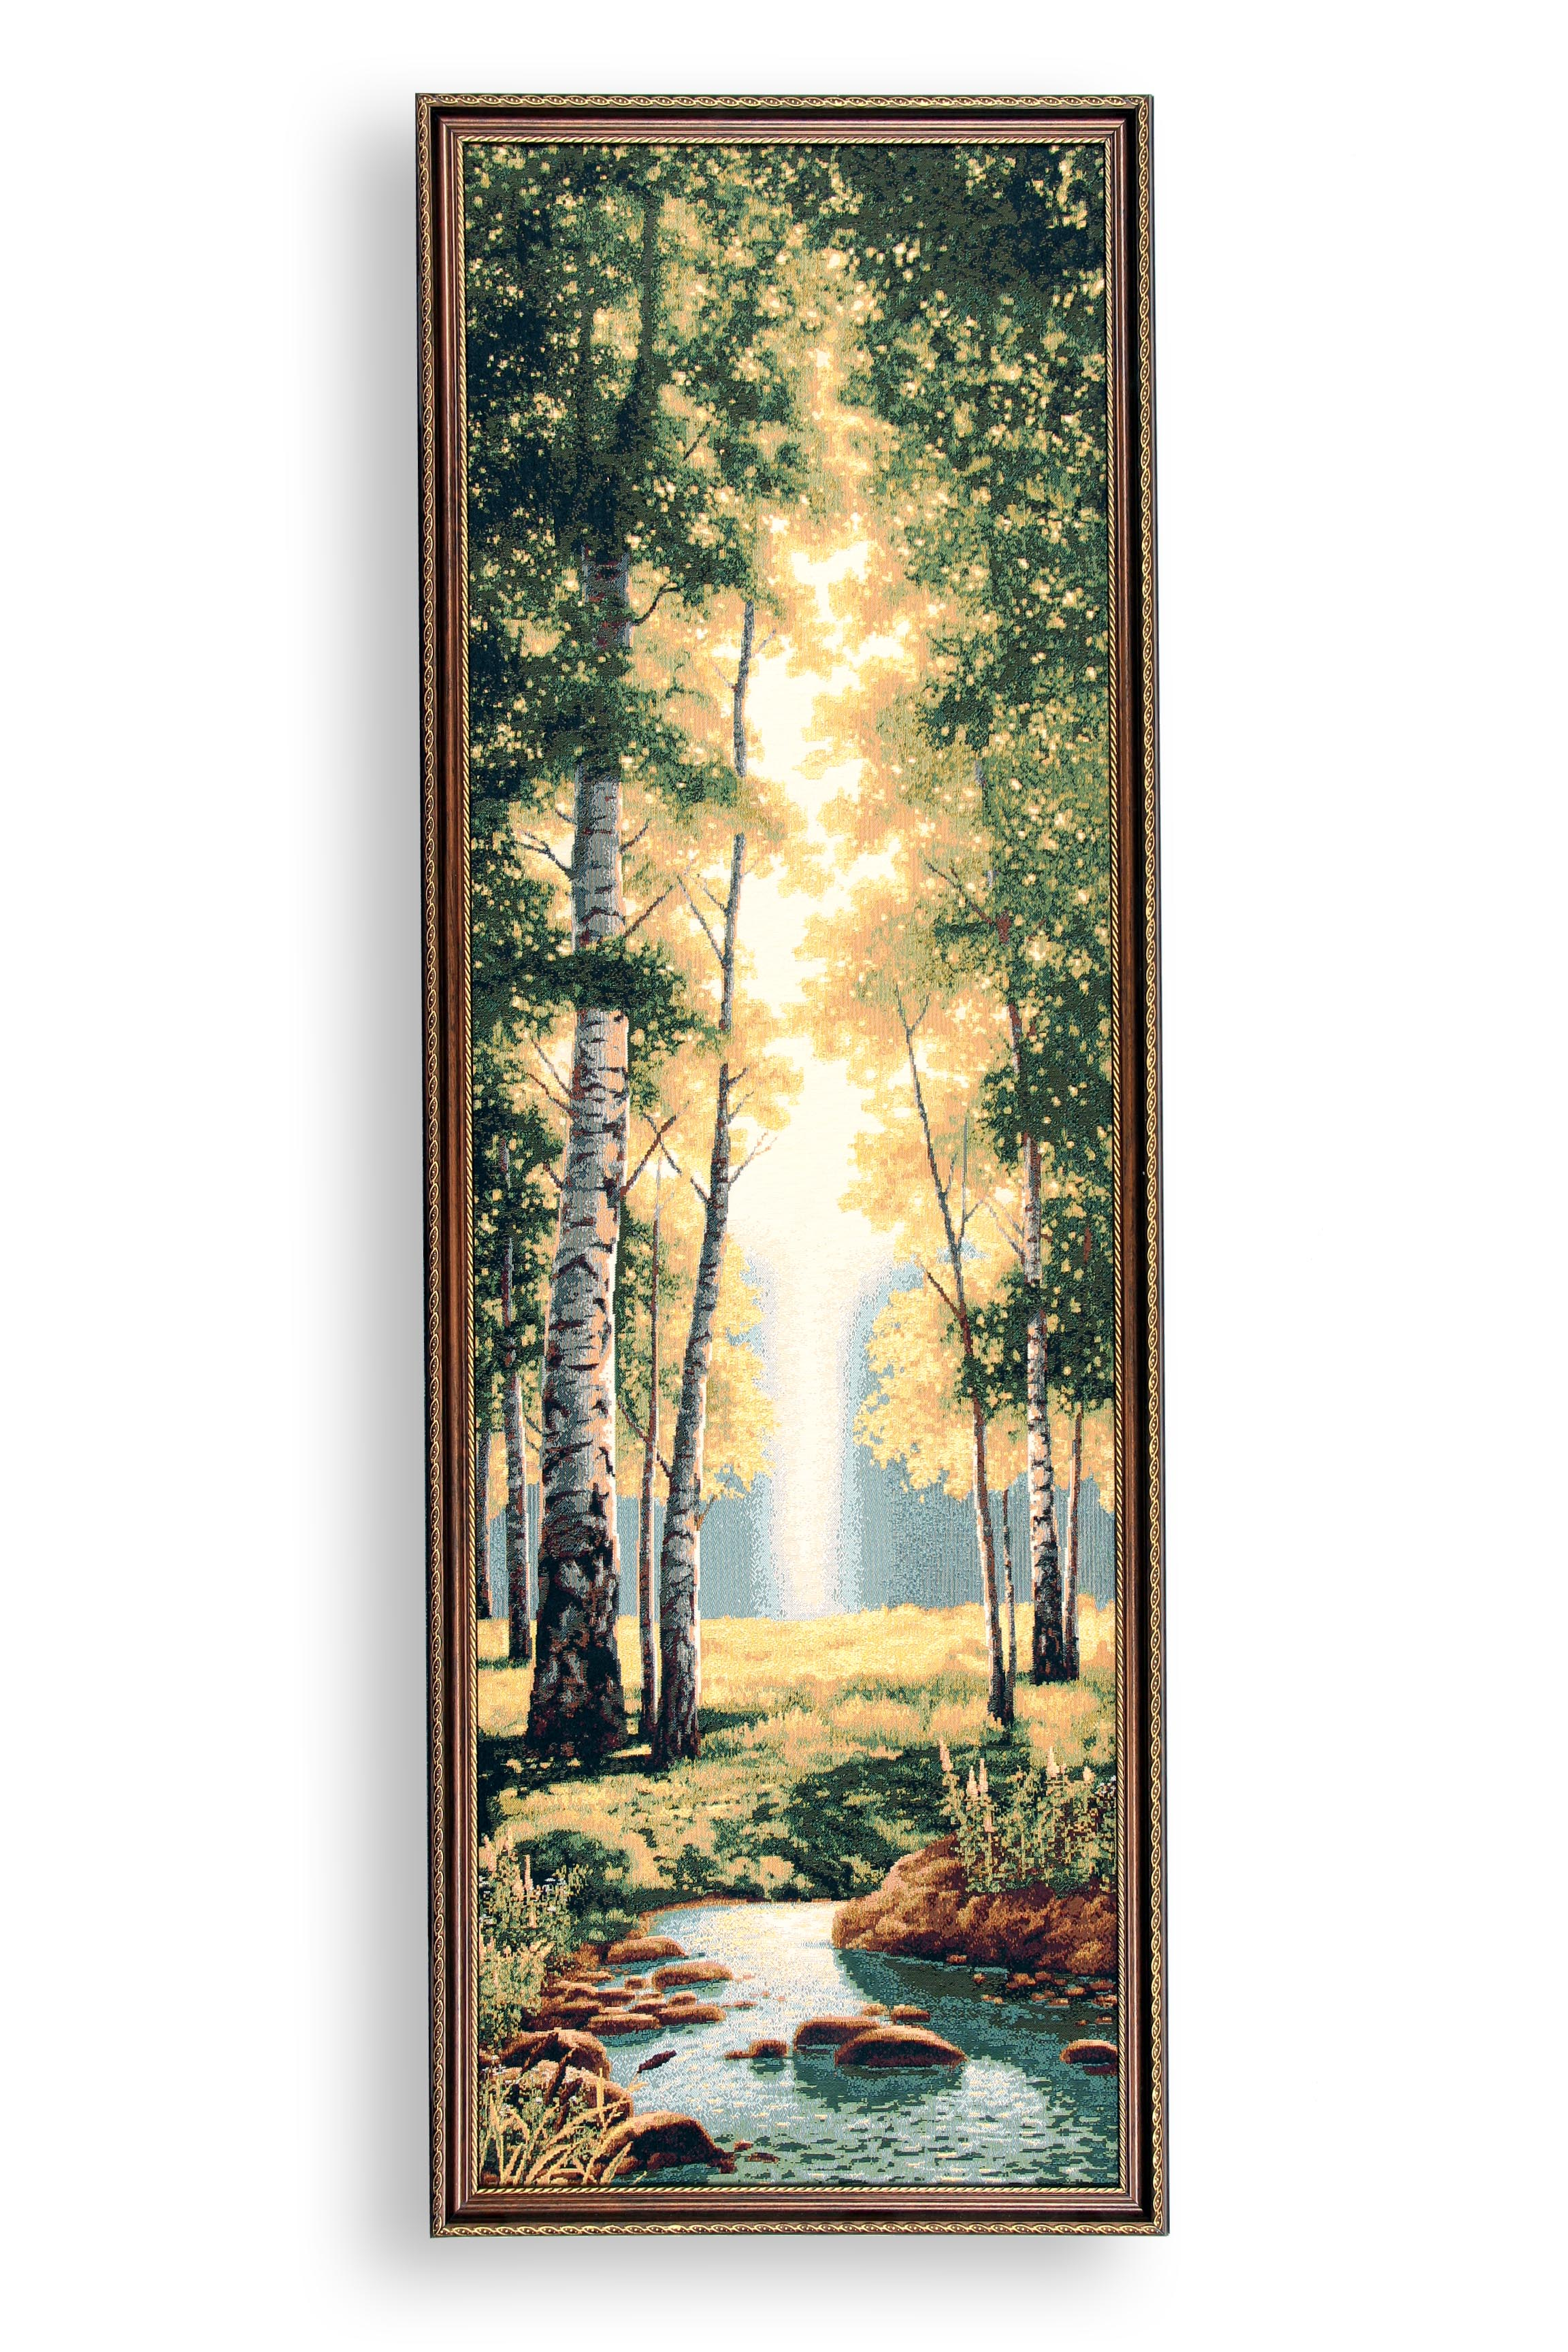 Картина Магазин гобеленов зеленый лес 40*115см, Гобелен цена и фото